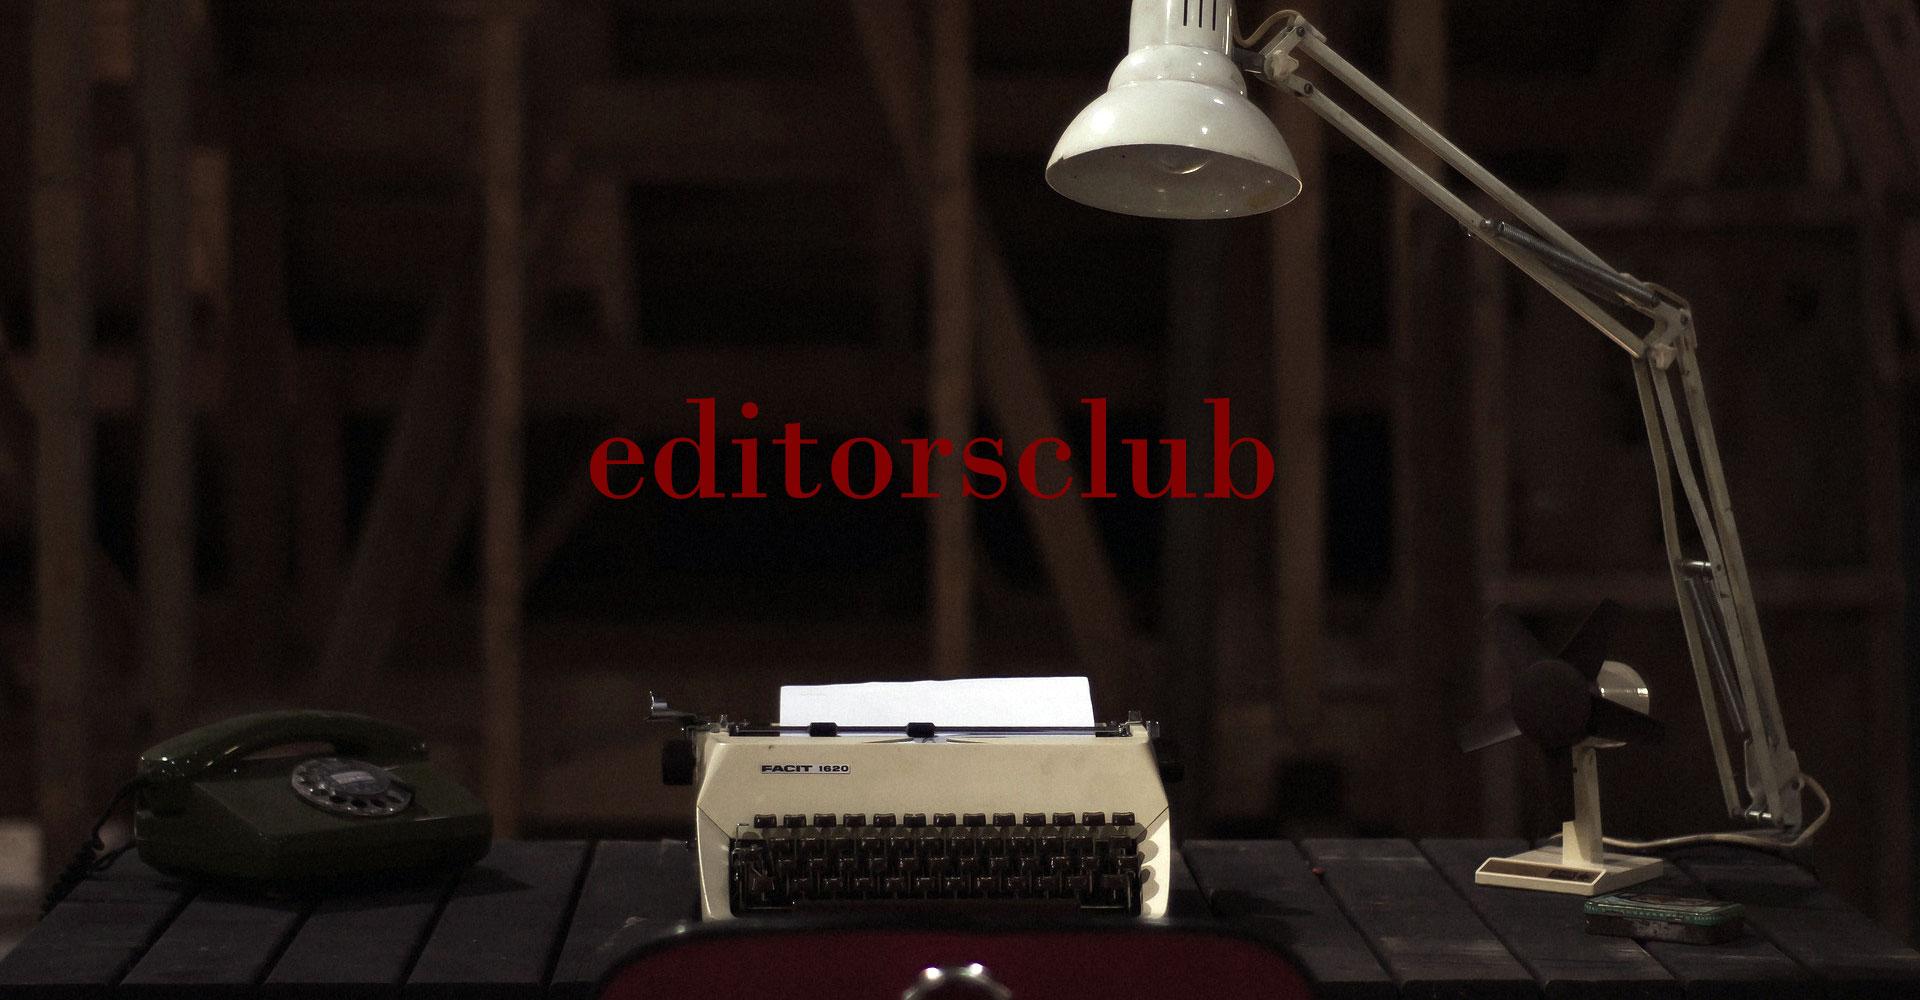 editorsclub